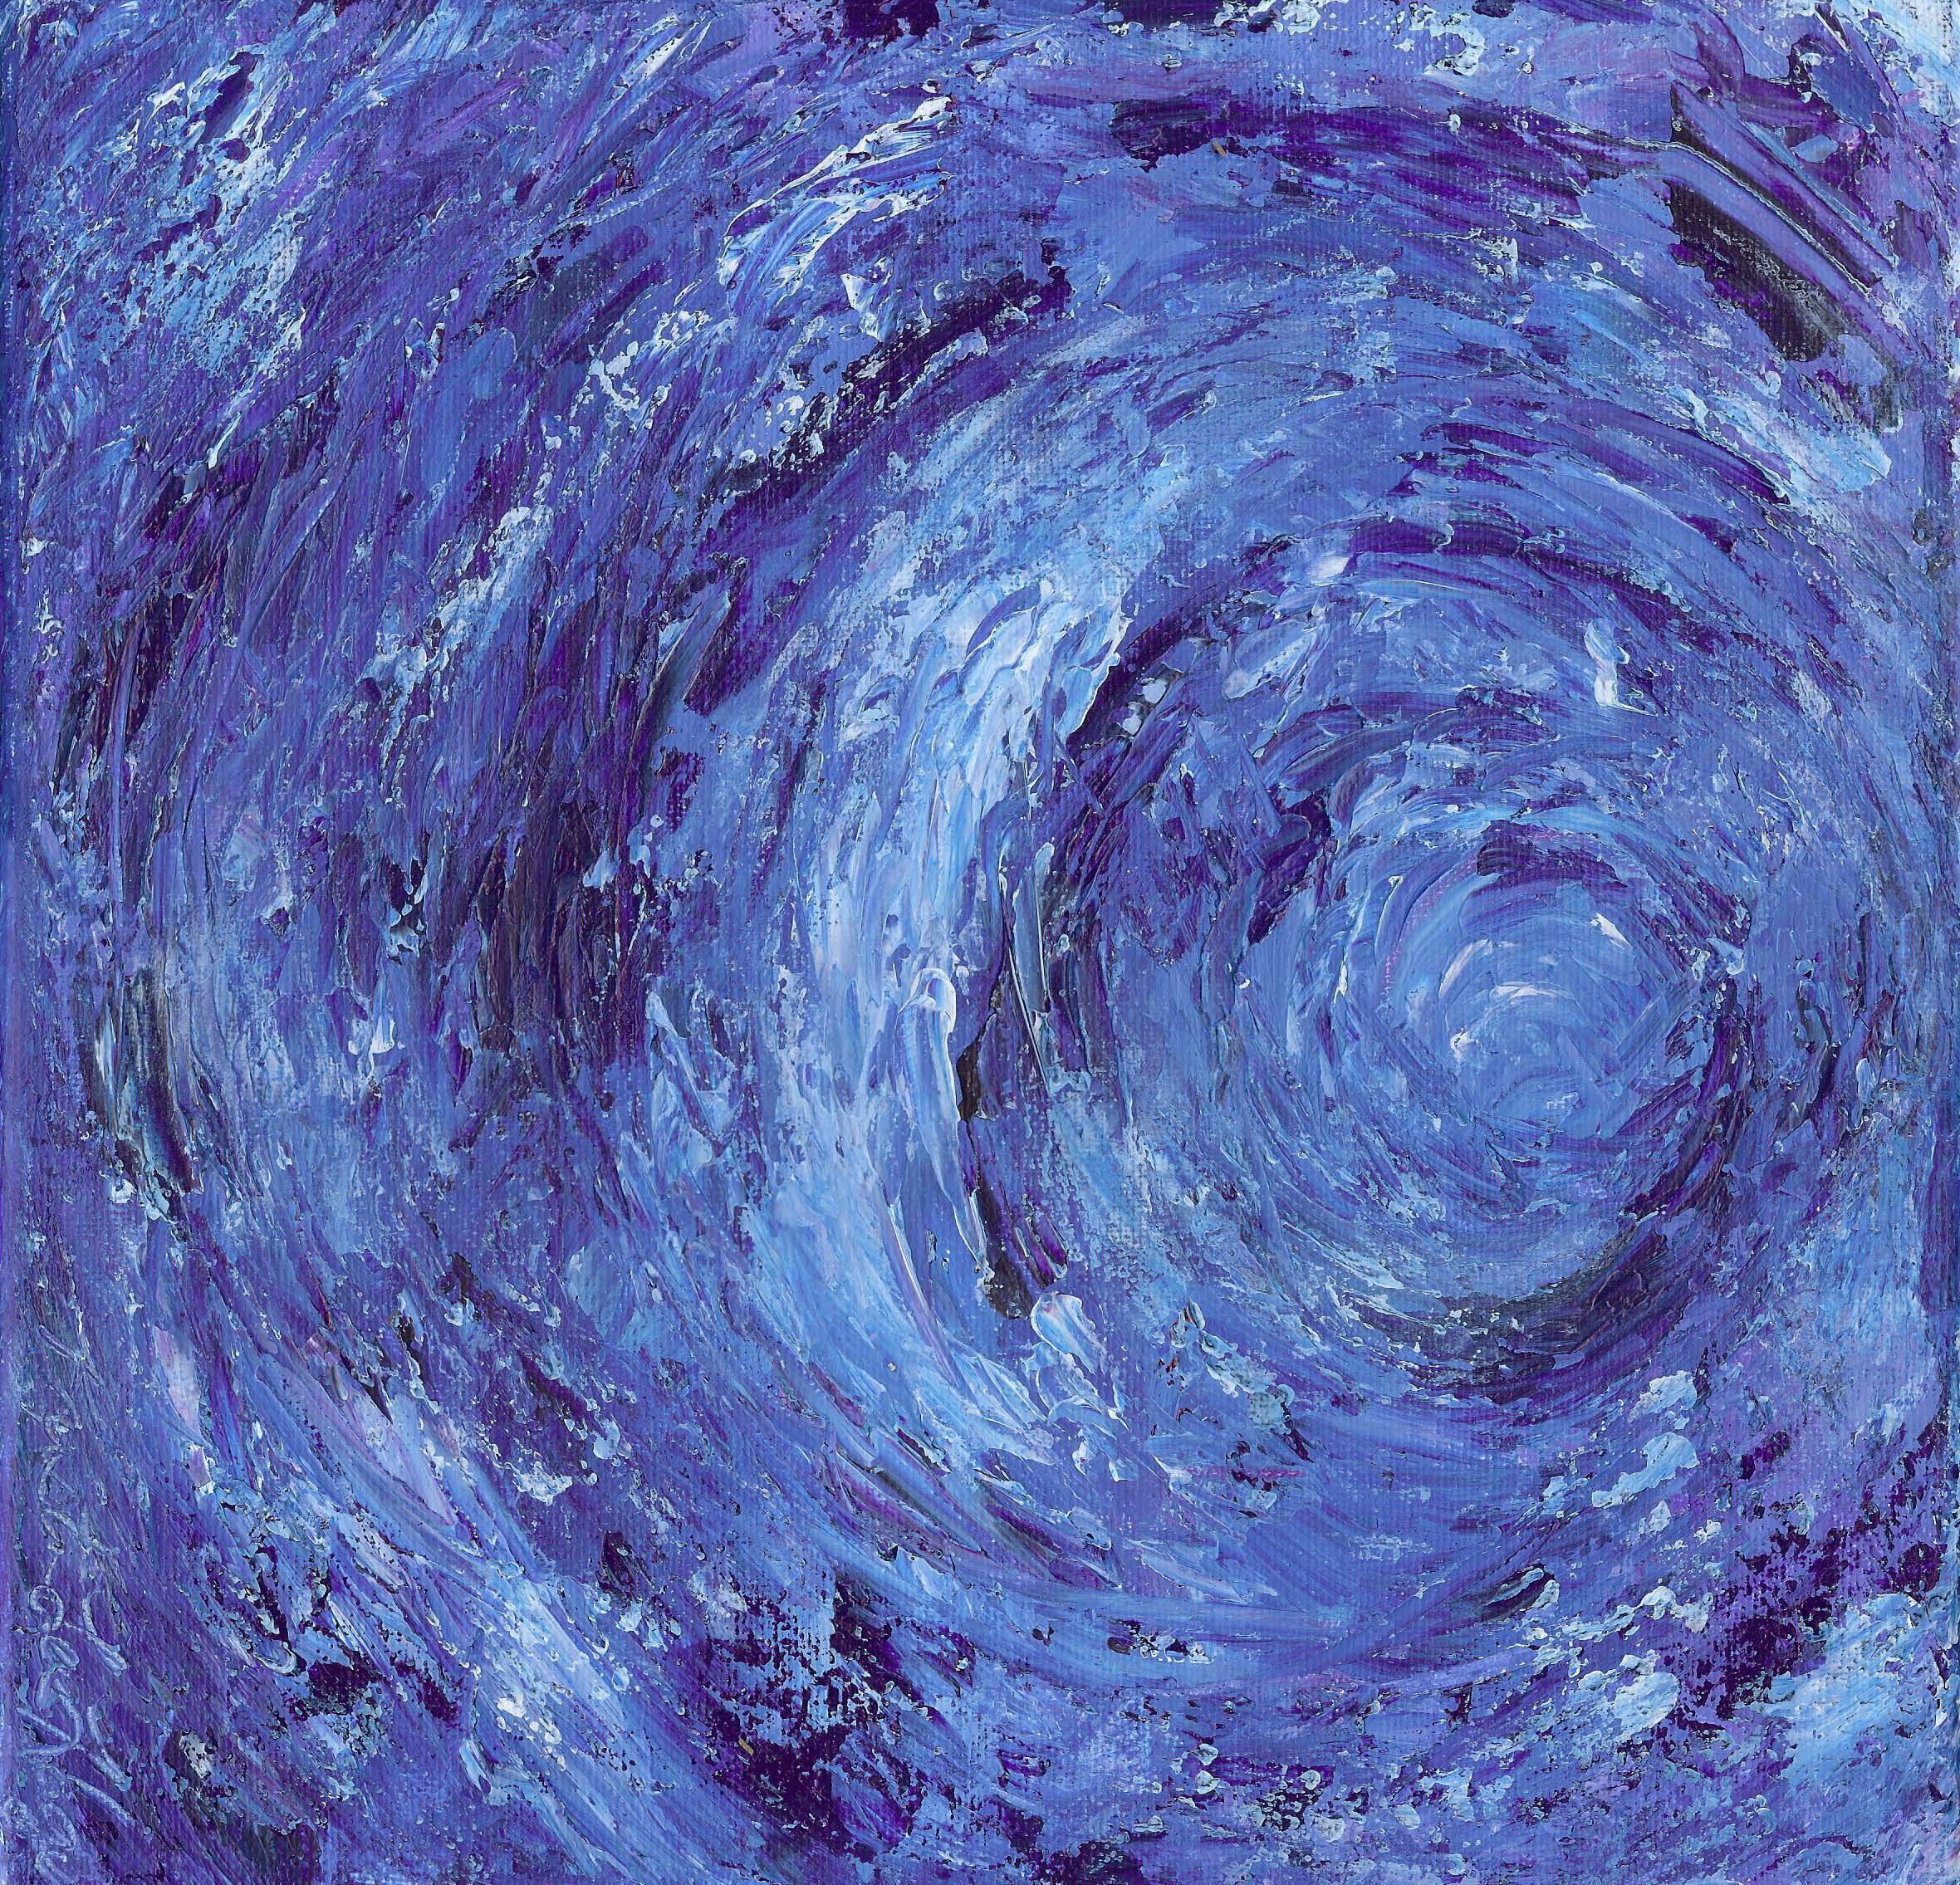 Blue Vortex - Acrylic 12 X 12 - $150